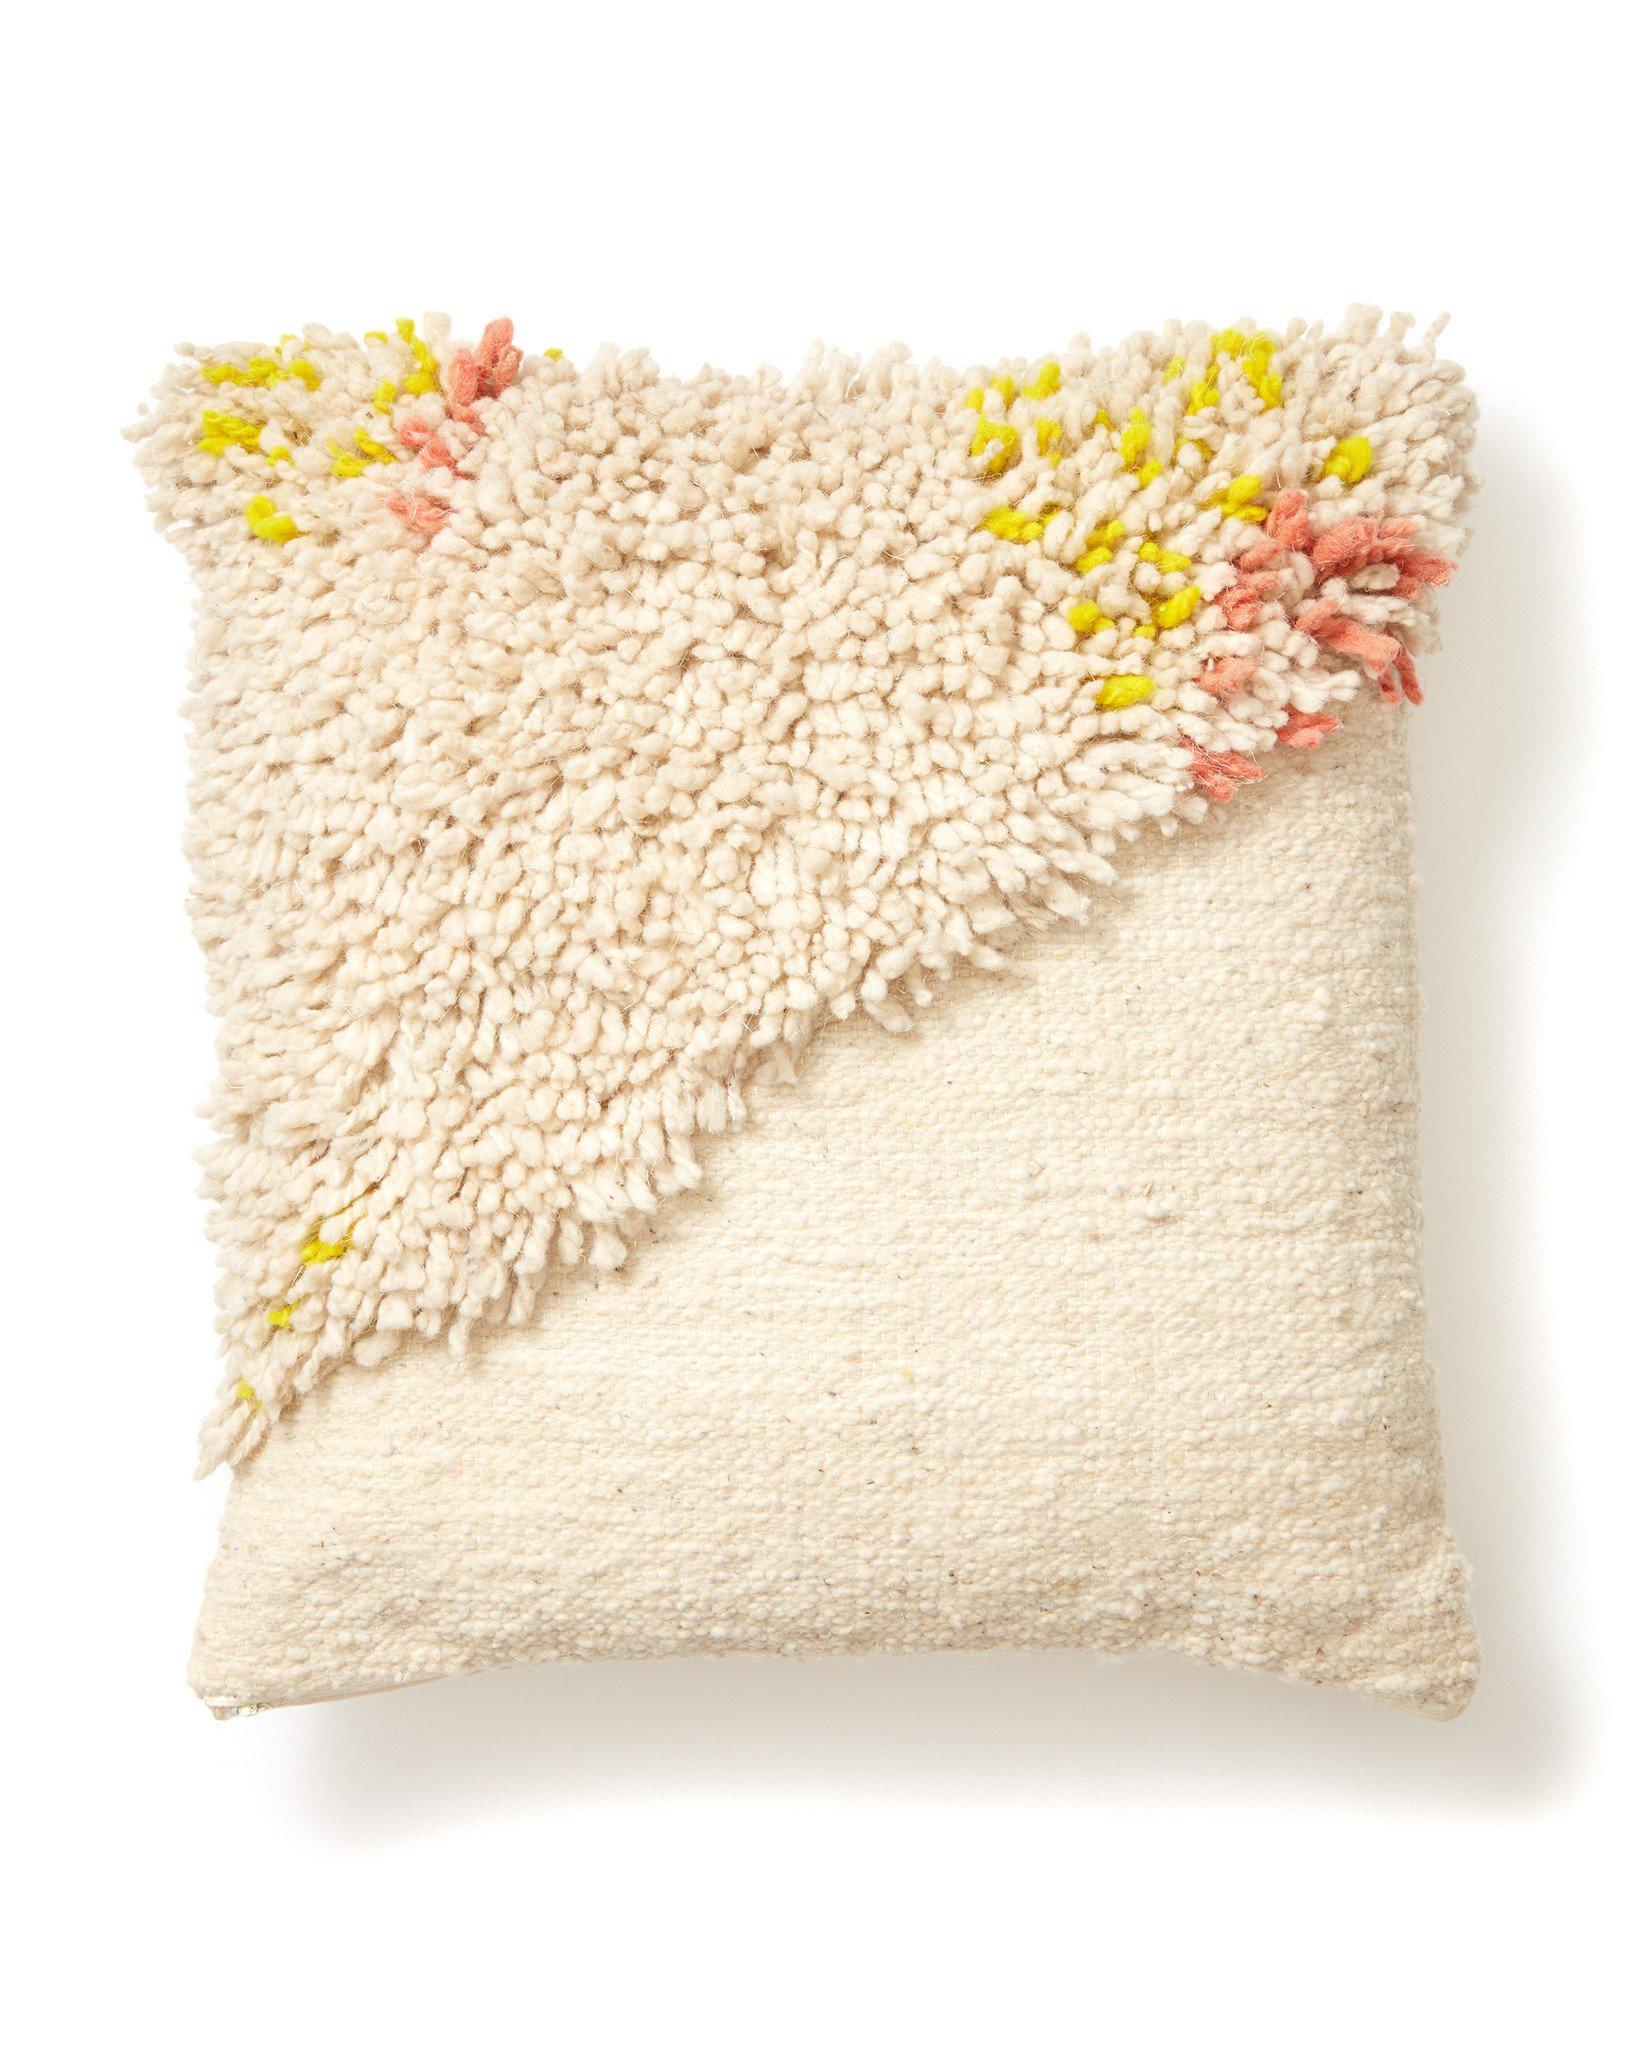 Pillow-SplitShag_900x@2x.progressive.jpg